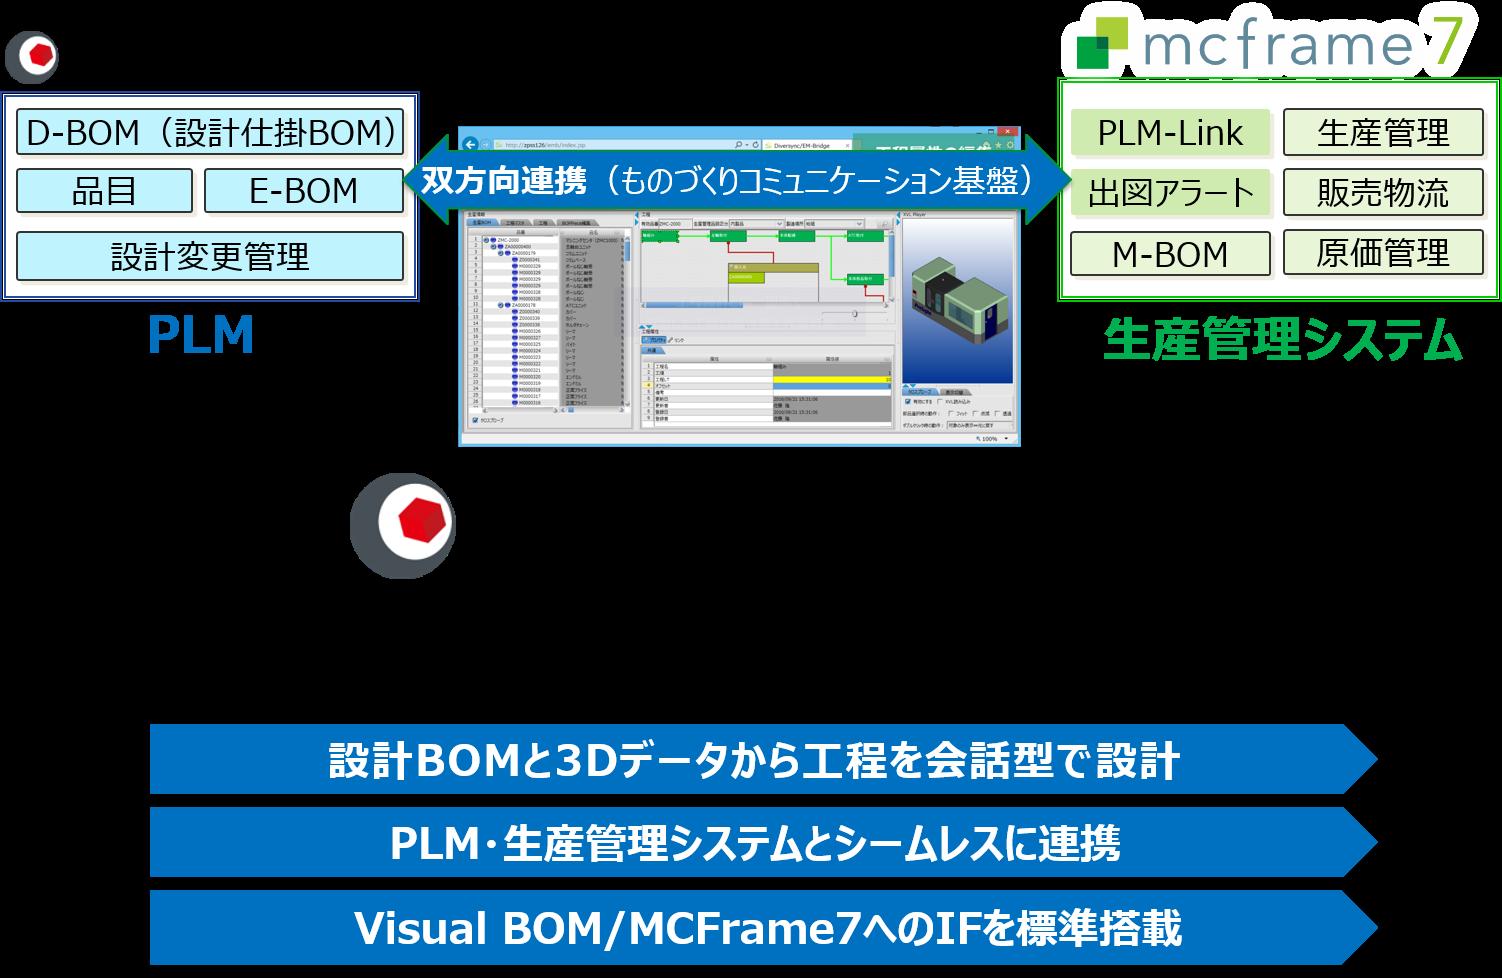 EM-Bridge_Image.png